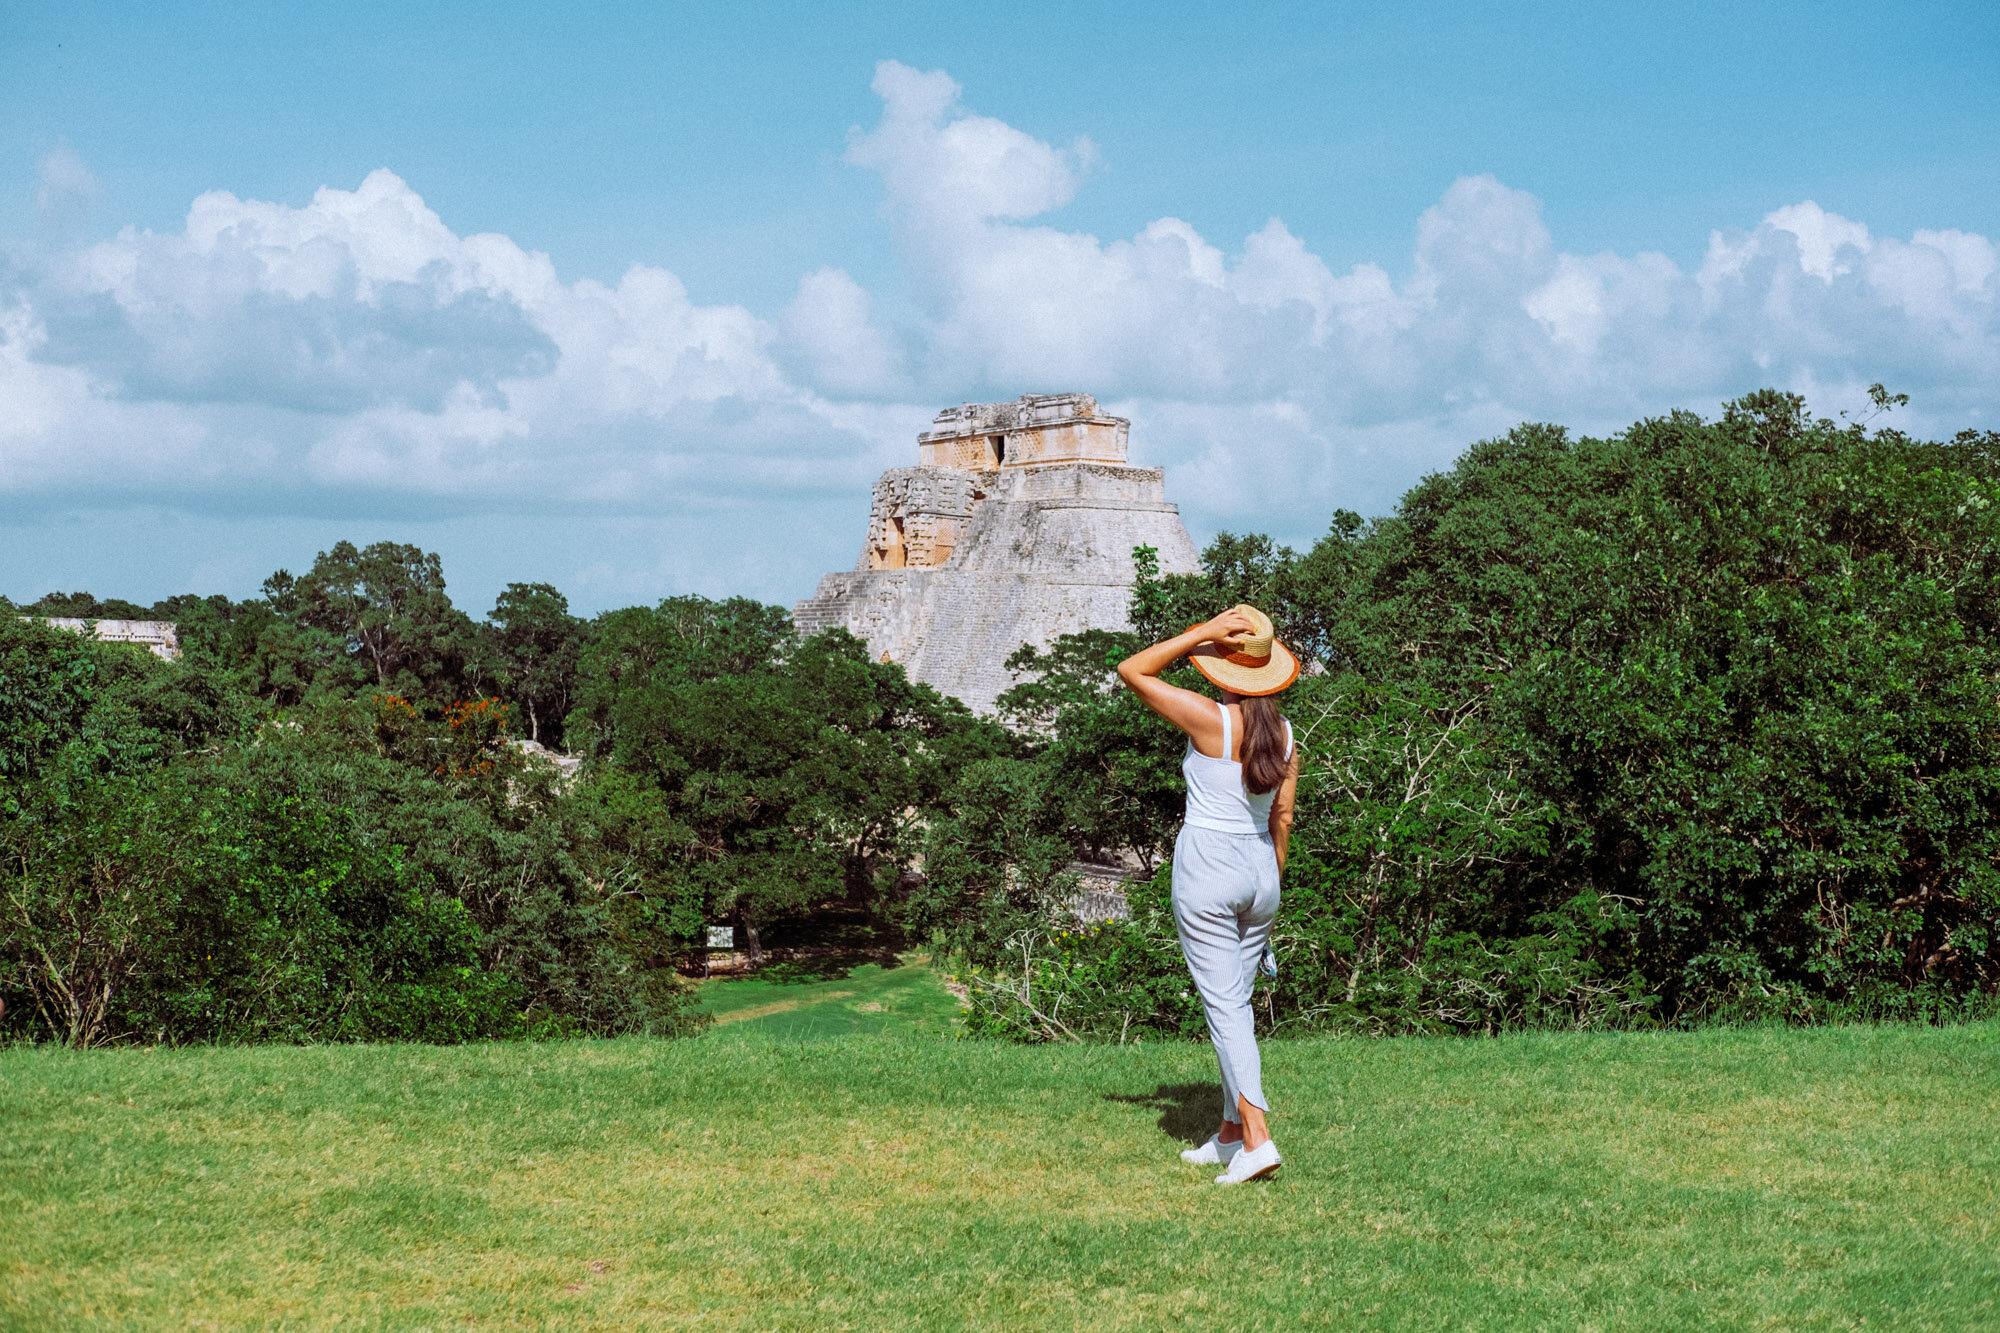 Rachel Off Duty: A Woman Admiring the Pyramids in Uxmal, Mexico